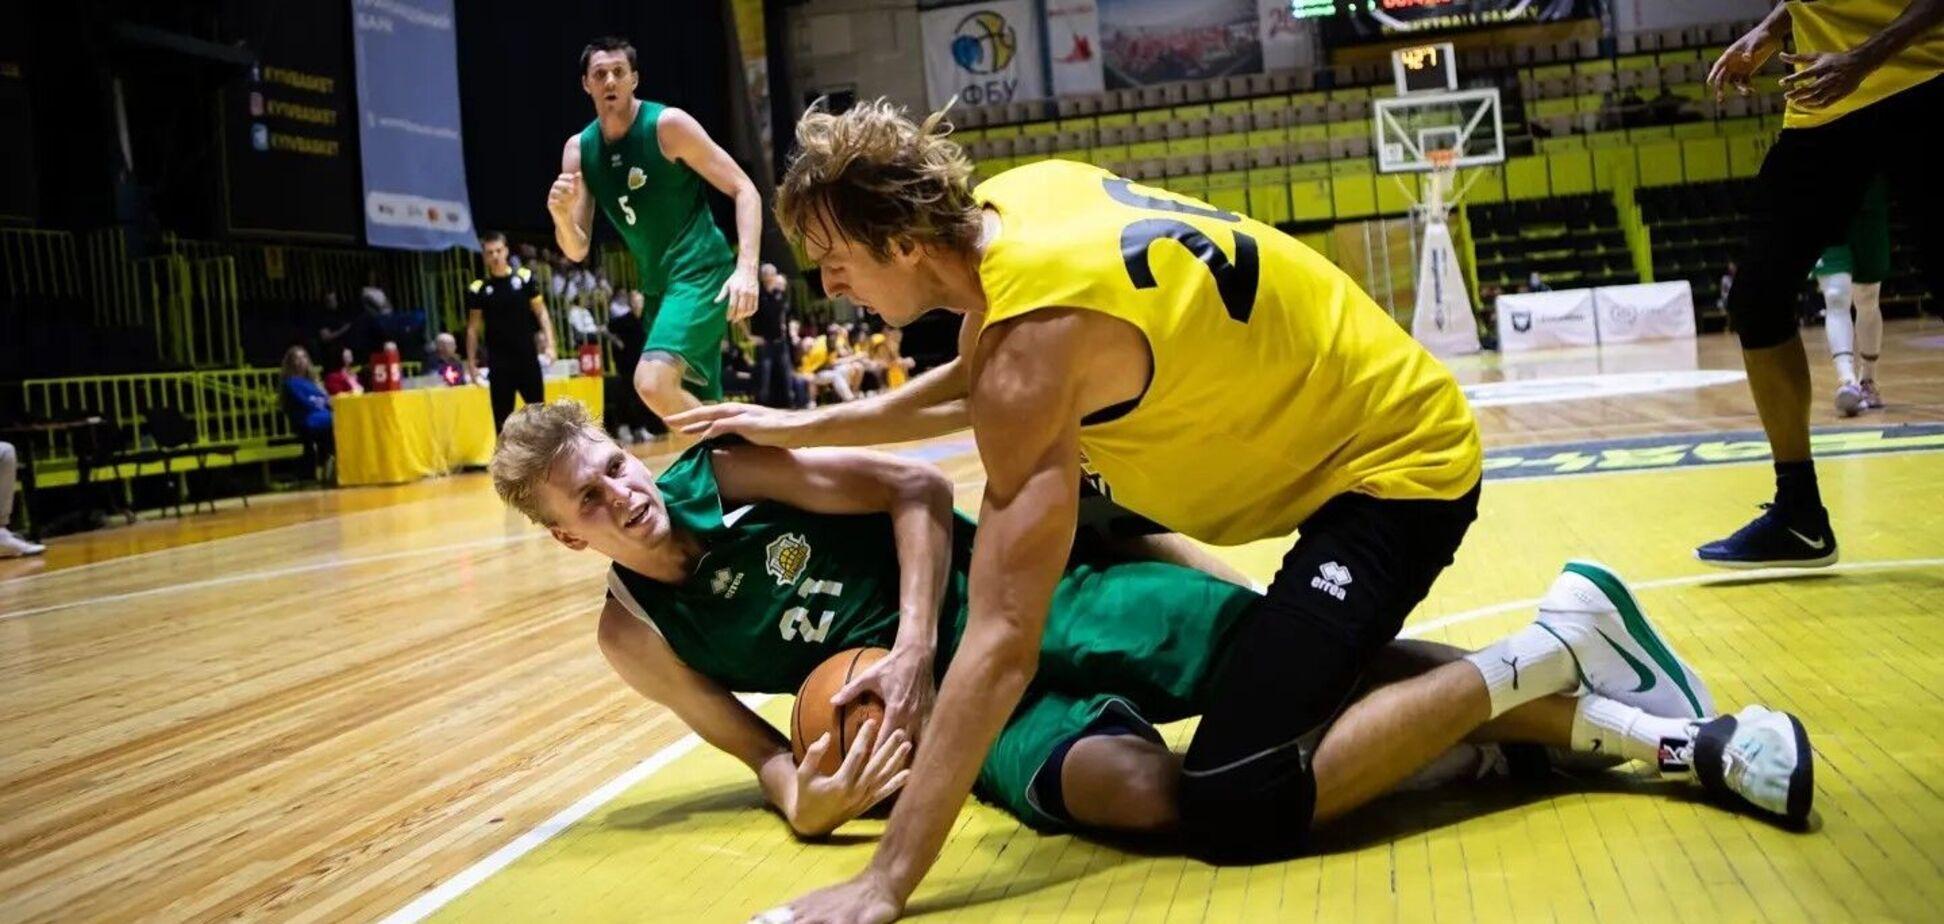 Анонс матчей Суперлиги WindRose 24 сентября